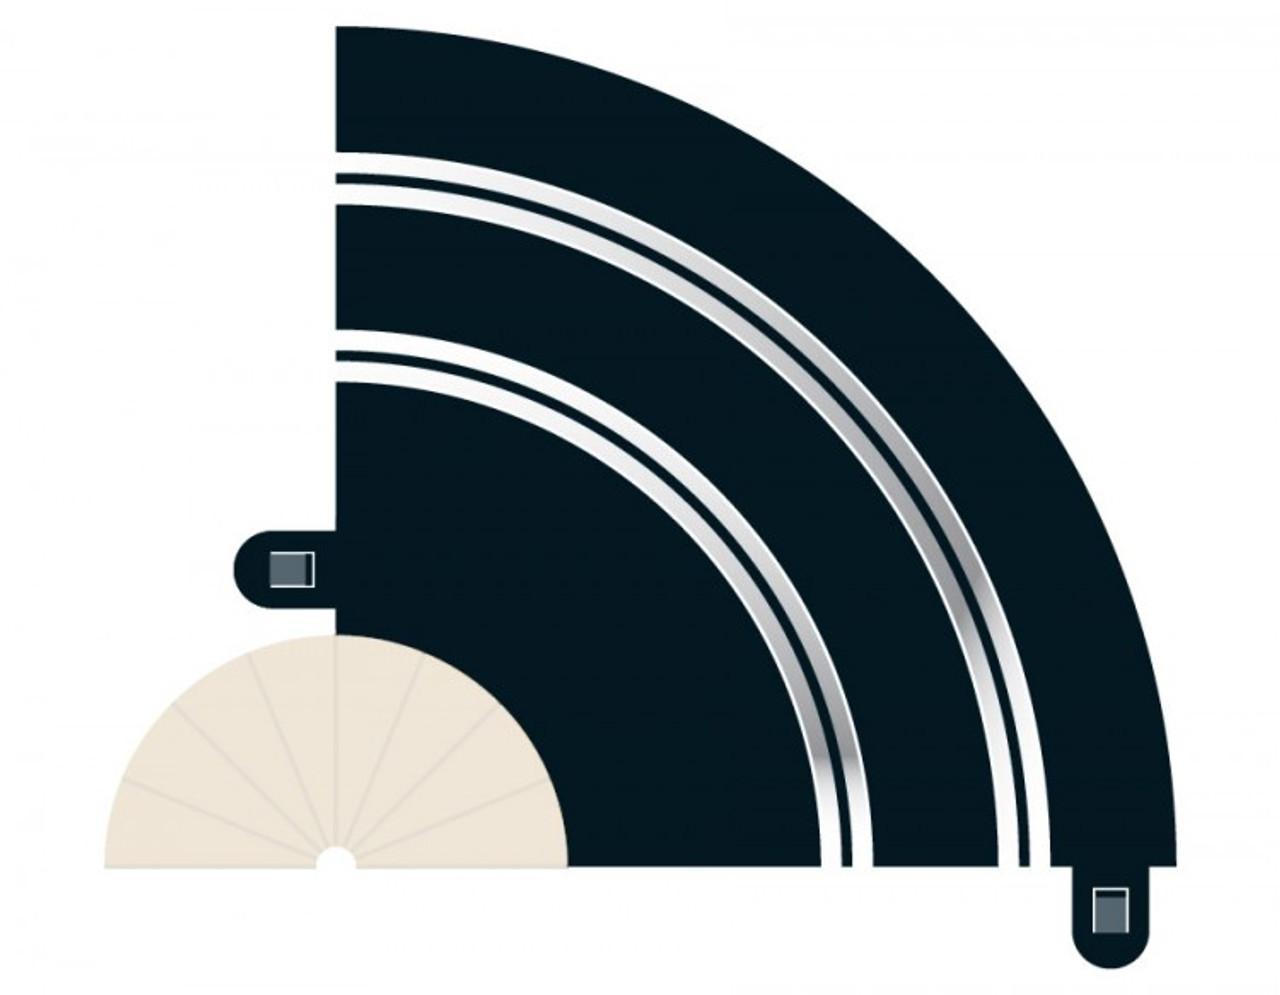 Scalextric C8201 Radius 1 Hairpin Curve 90 degree x 2 Slot Car Track